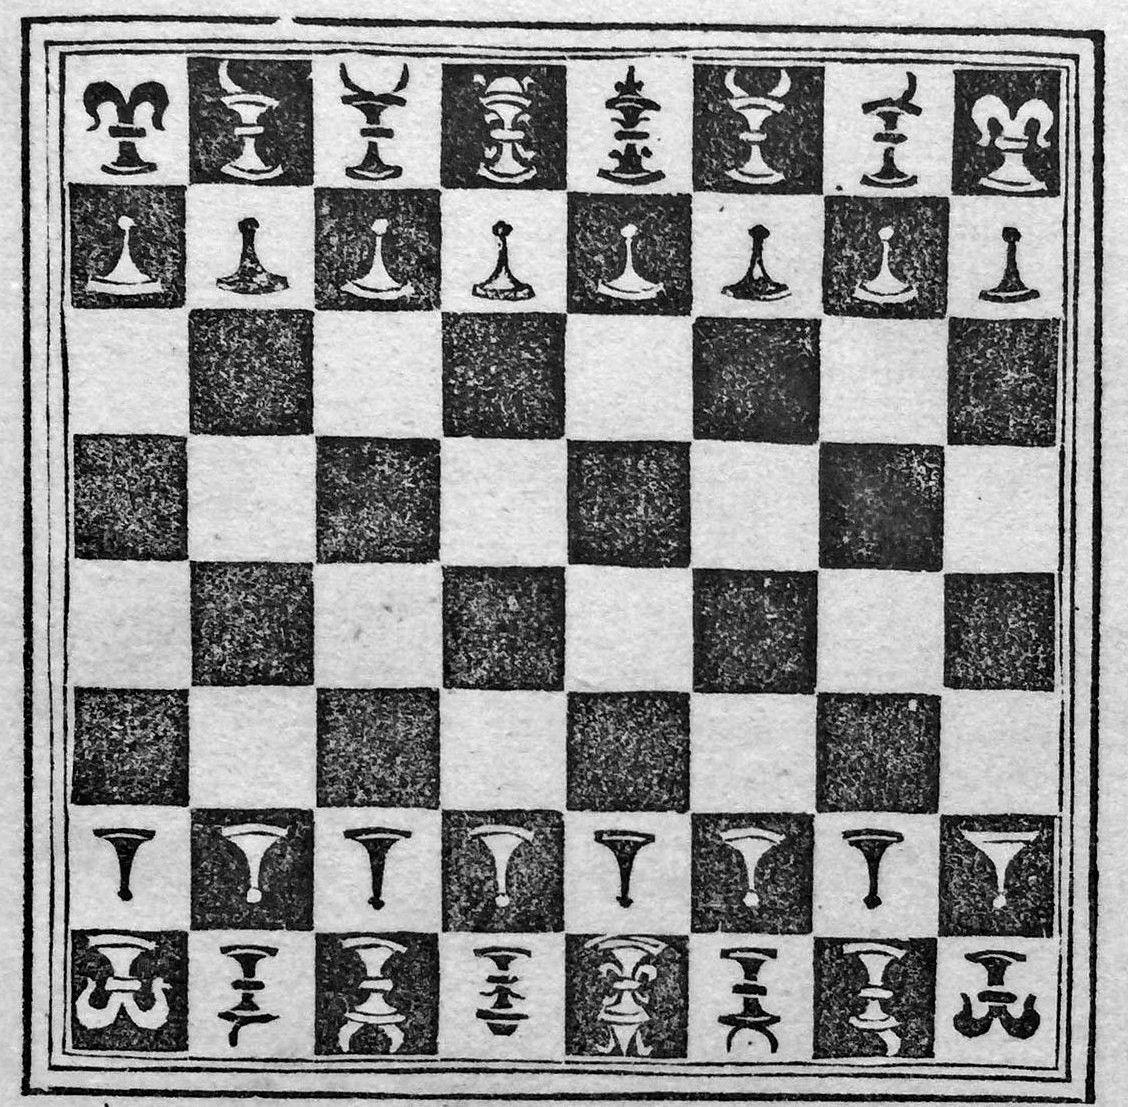 Detail of Publicius's chess set